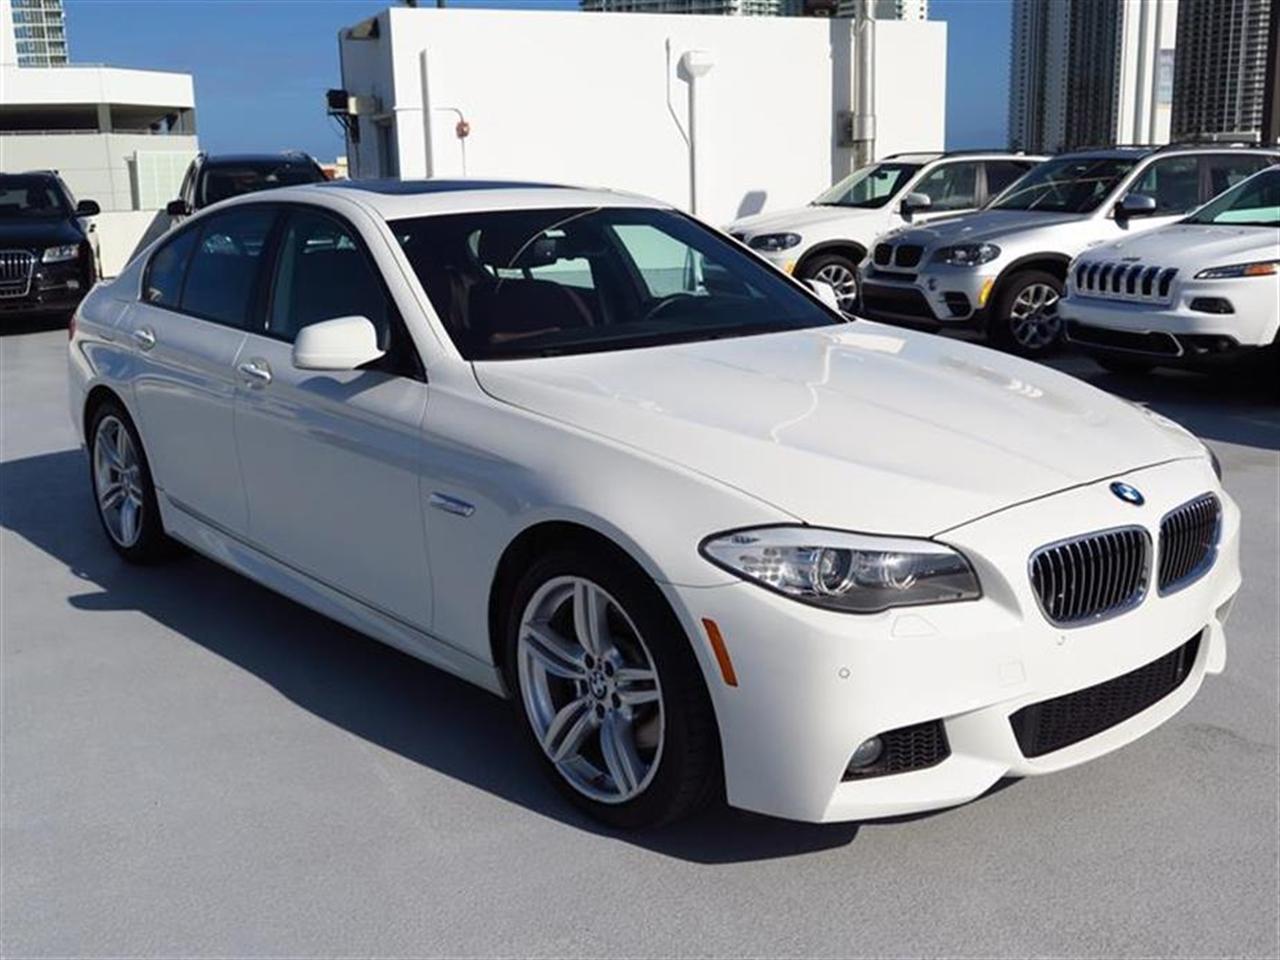 2012 BMW 5 SERIES 4dr Sdn 535i RWD 25398 miles VIN WBAFR7C54CC811462